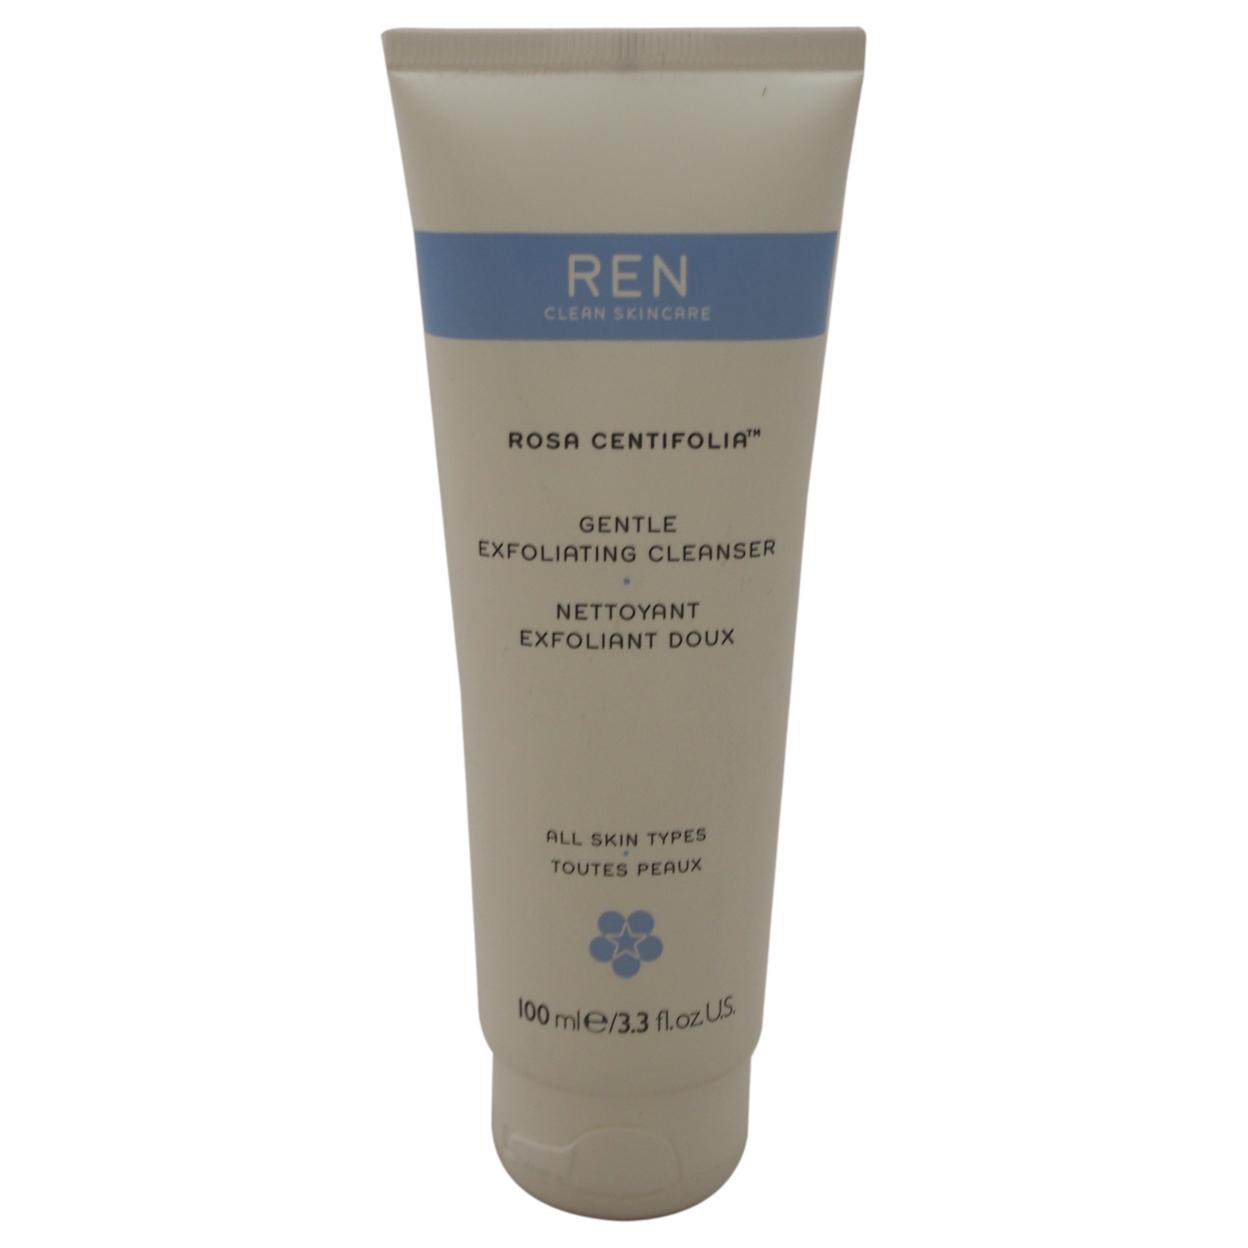 Rosa Centifolia Gentle Exfoliating Cleanser by REN for Unisex - 3.3 oz Cleanser 58653c96e2246122df59637c